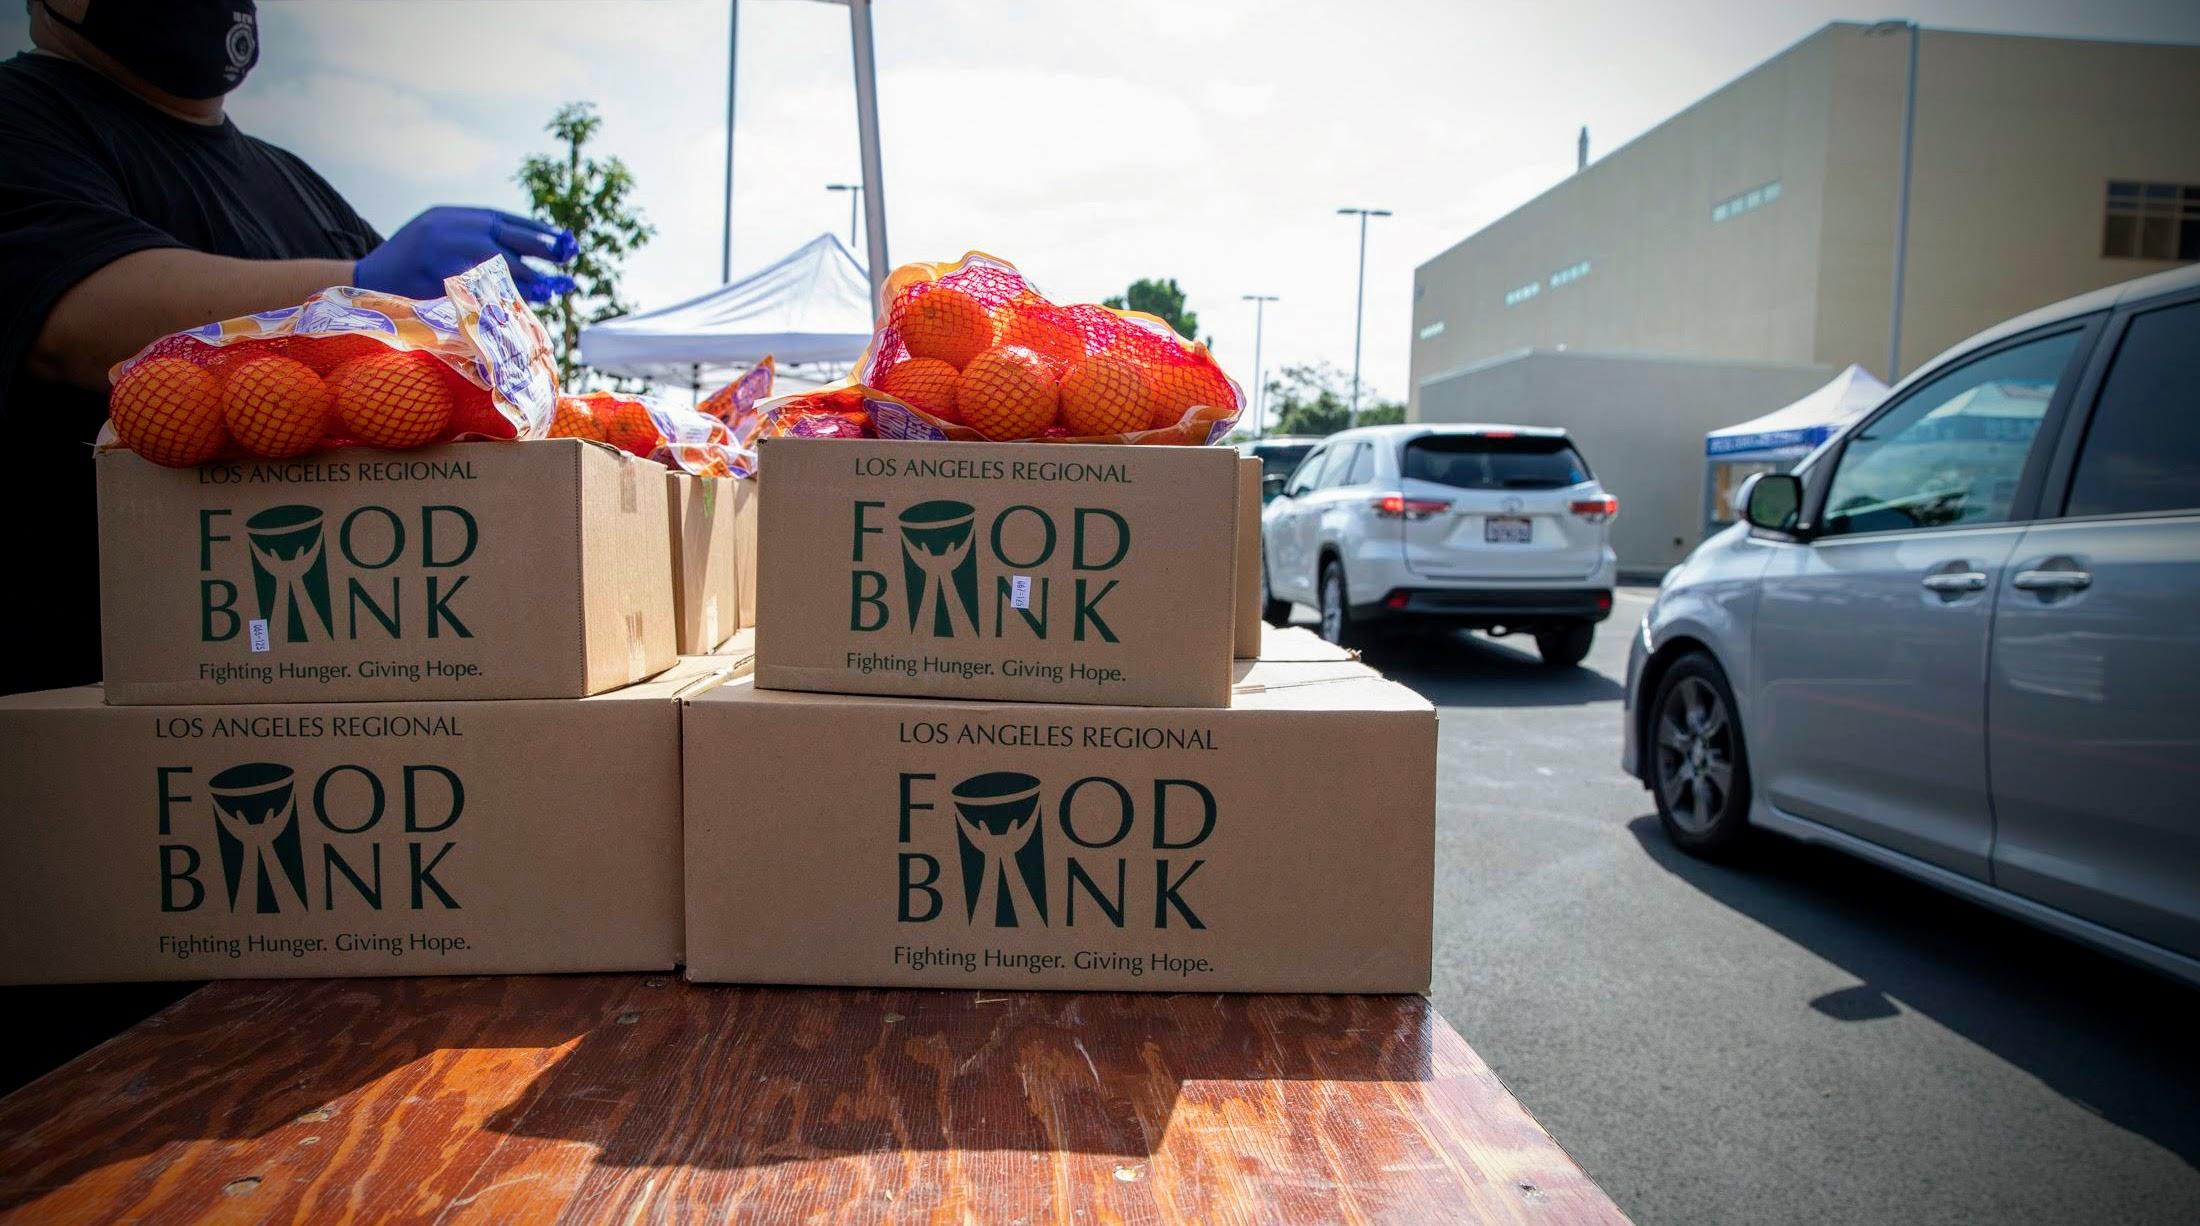 Long Beach City College Free Food Distribution: 10/29/21